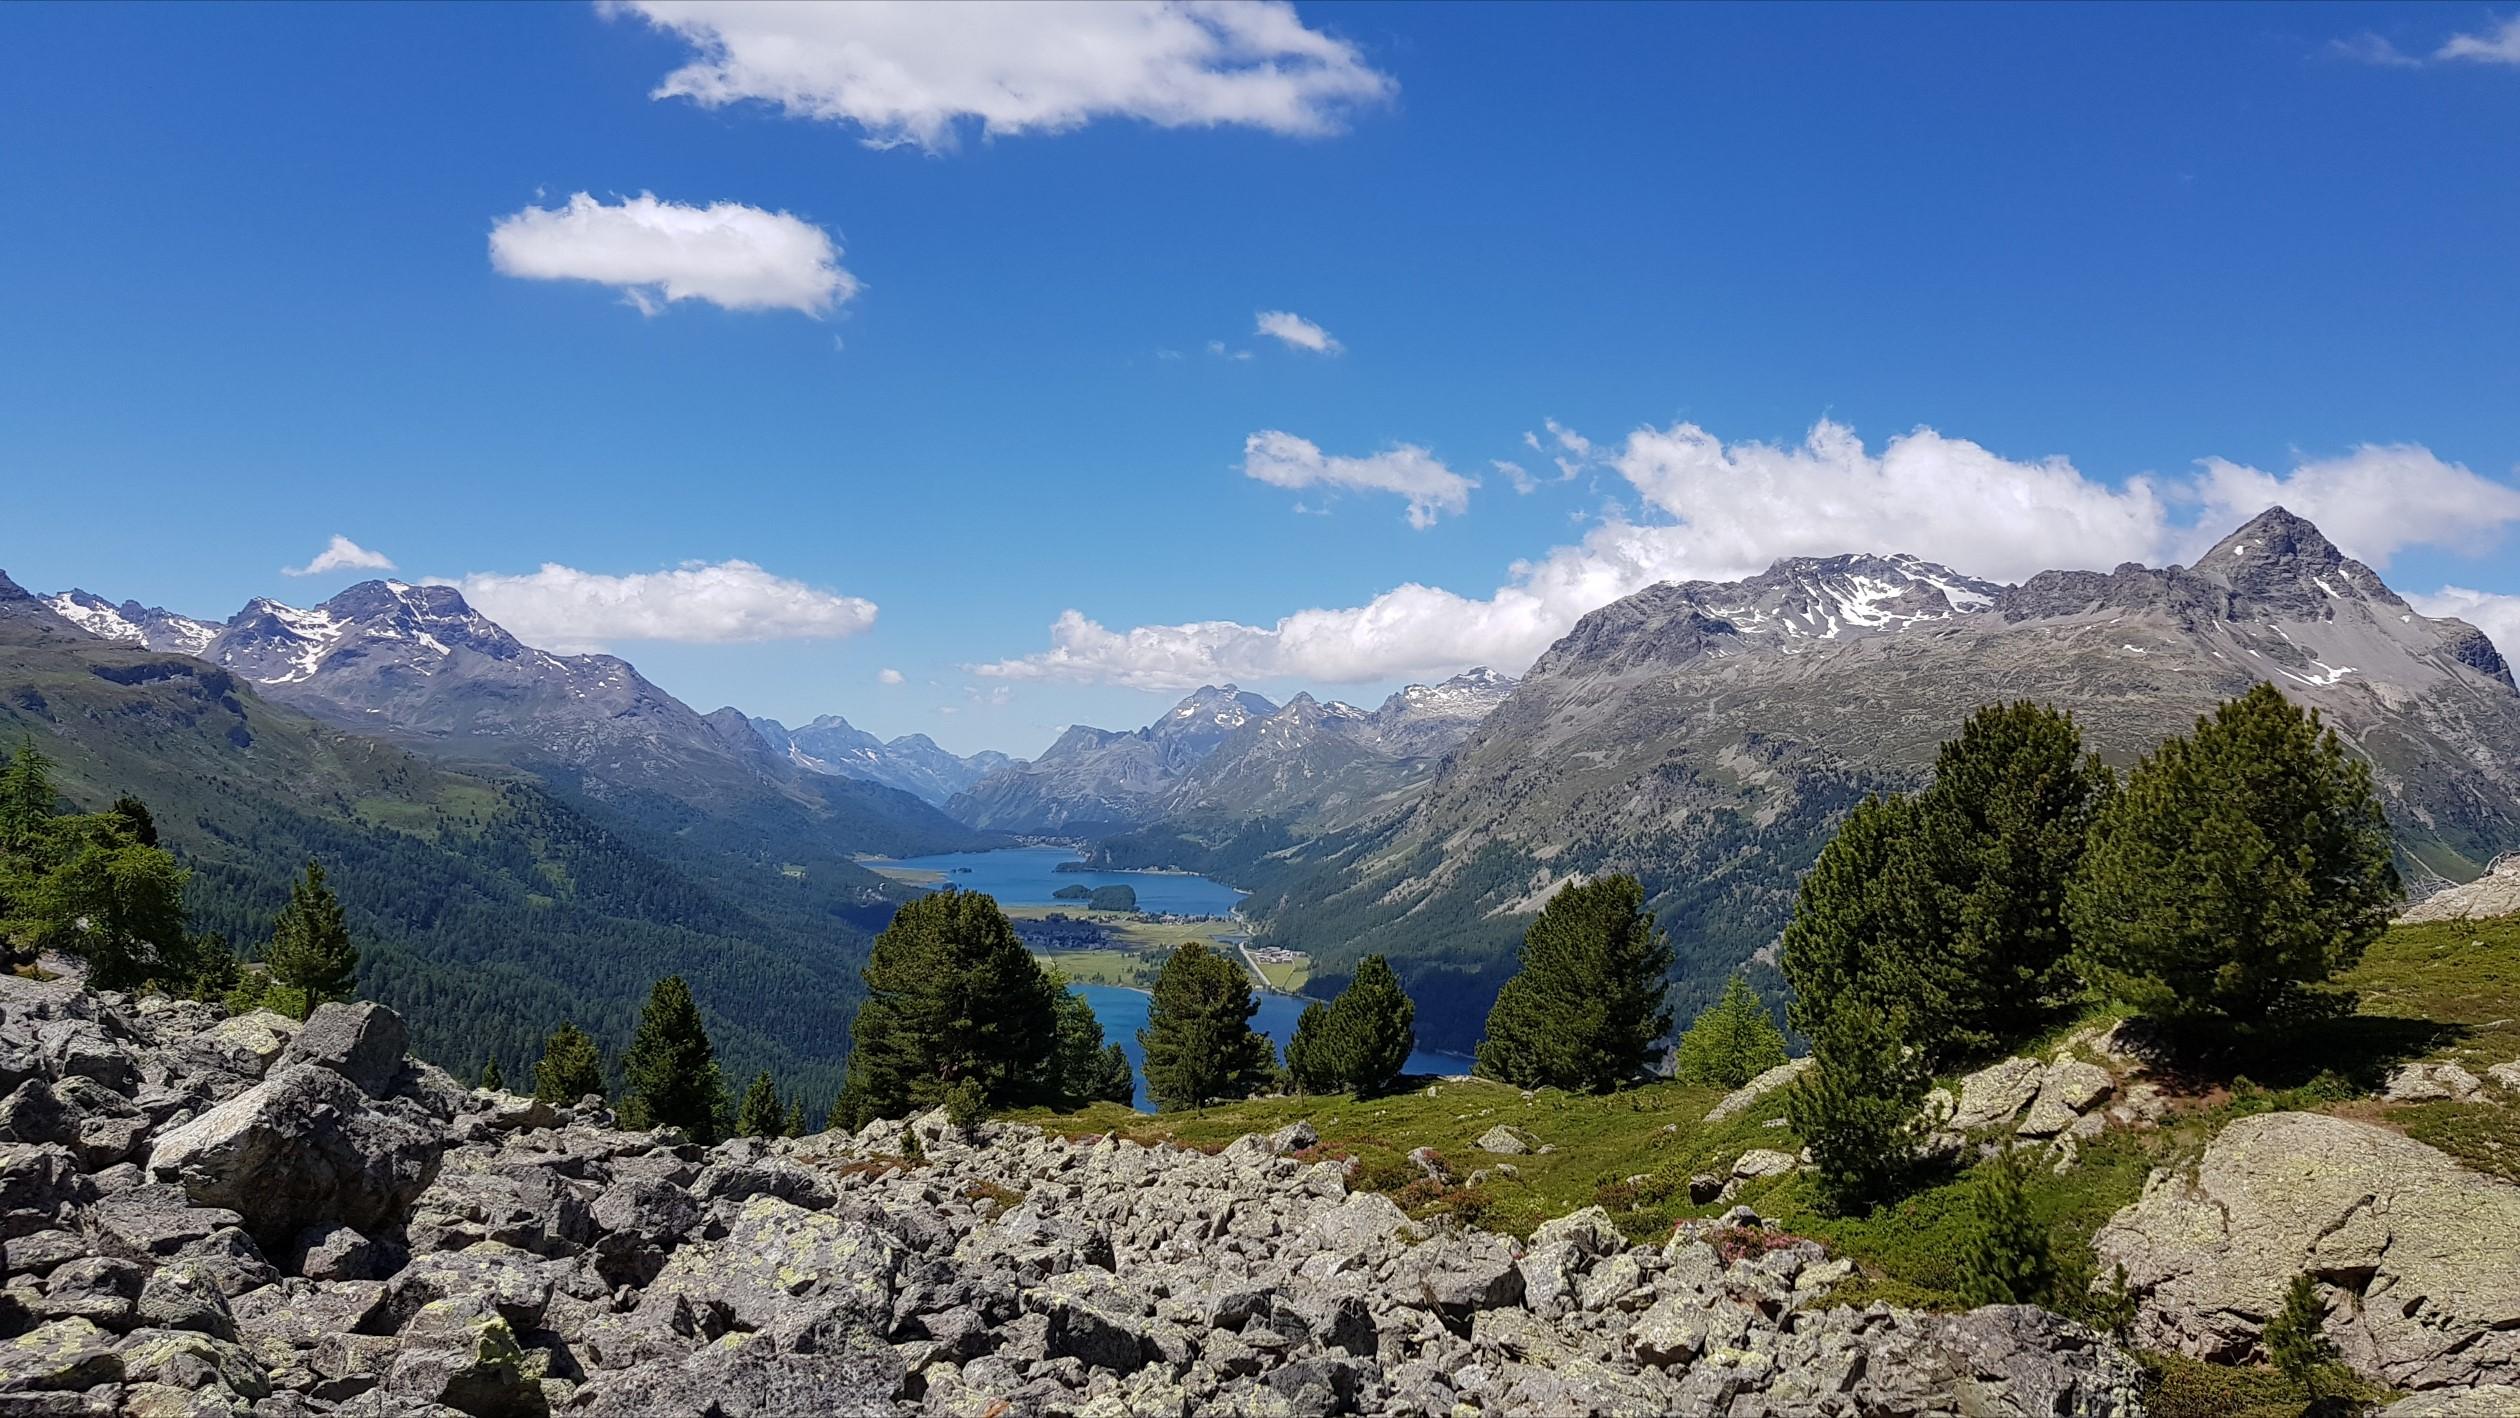 Engadine, St. Moritz, Hahnensee, view in direction Maloja with Lake Silvaplana, Lake Sils, Chaste